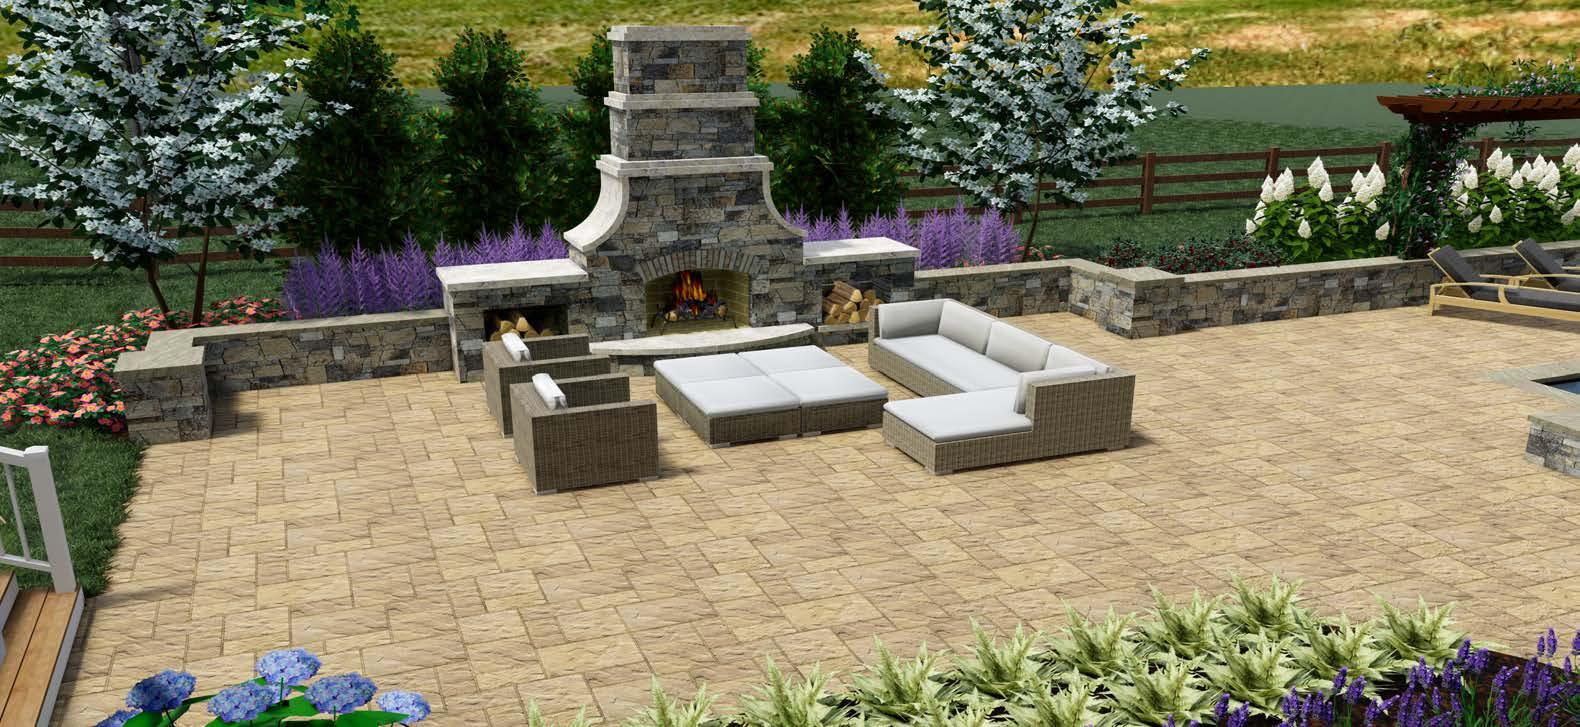 landscape-design-3D-rendering-ashburn-aldie-leesburg-va-17